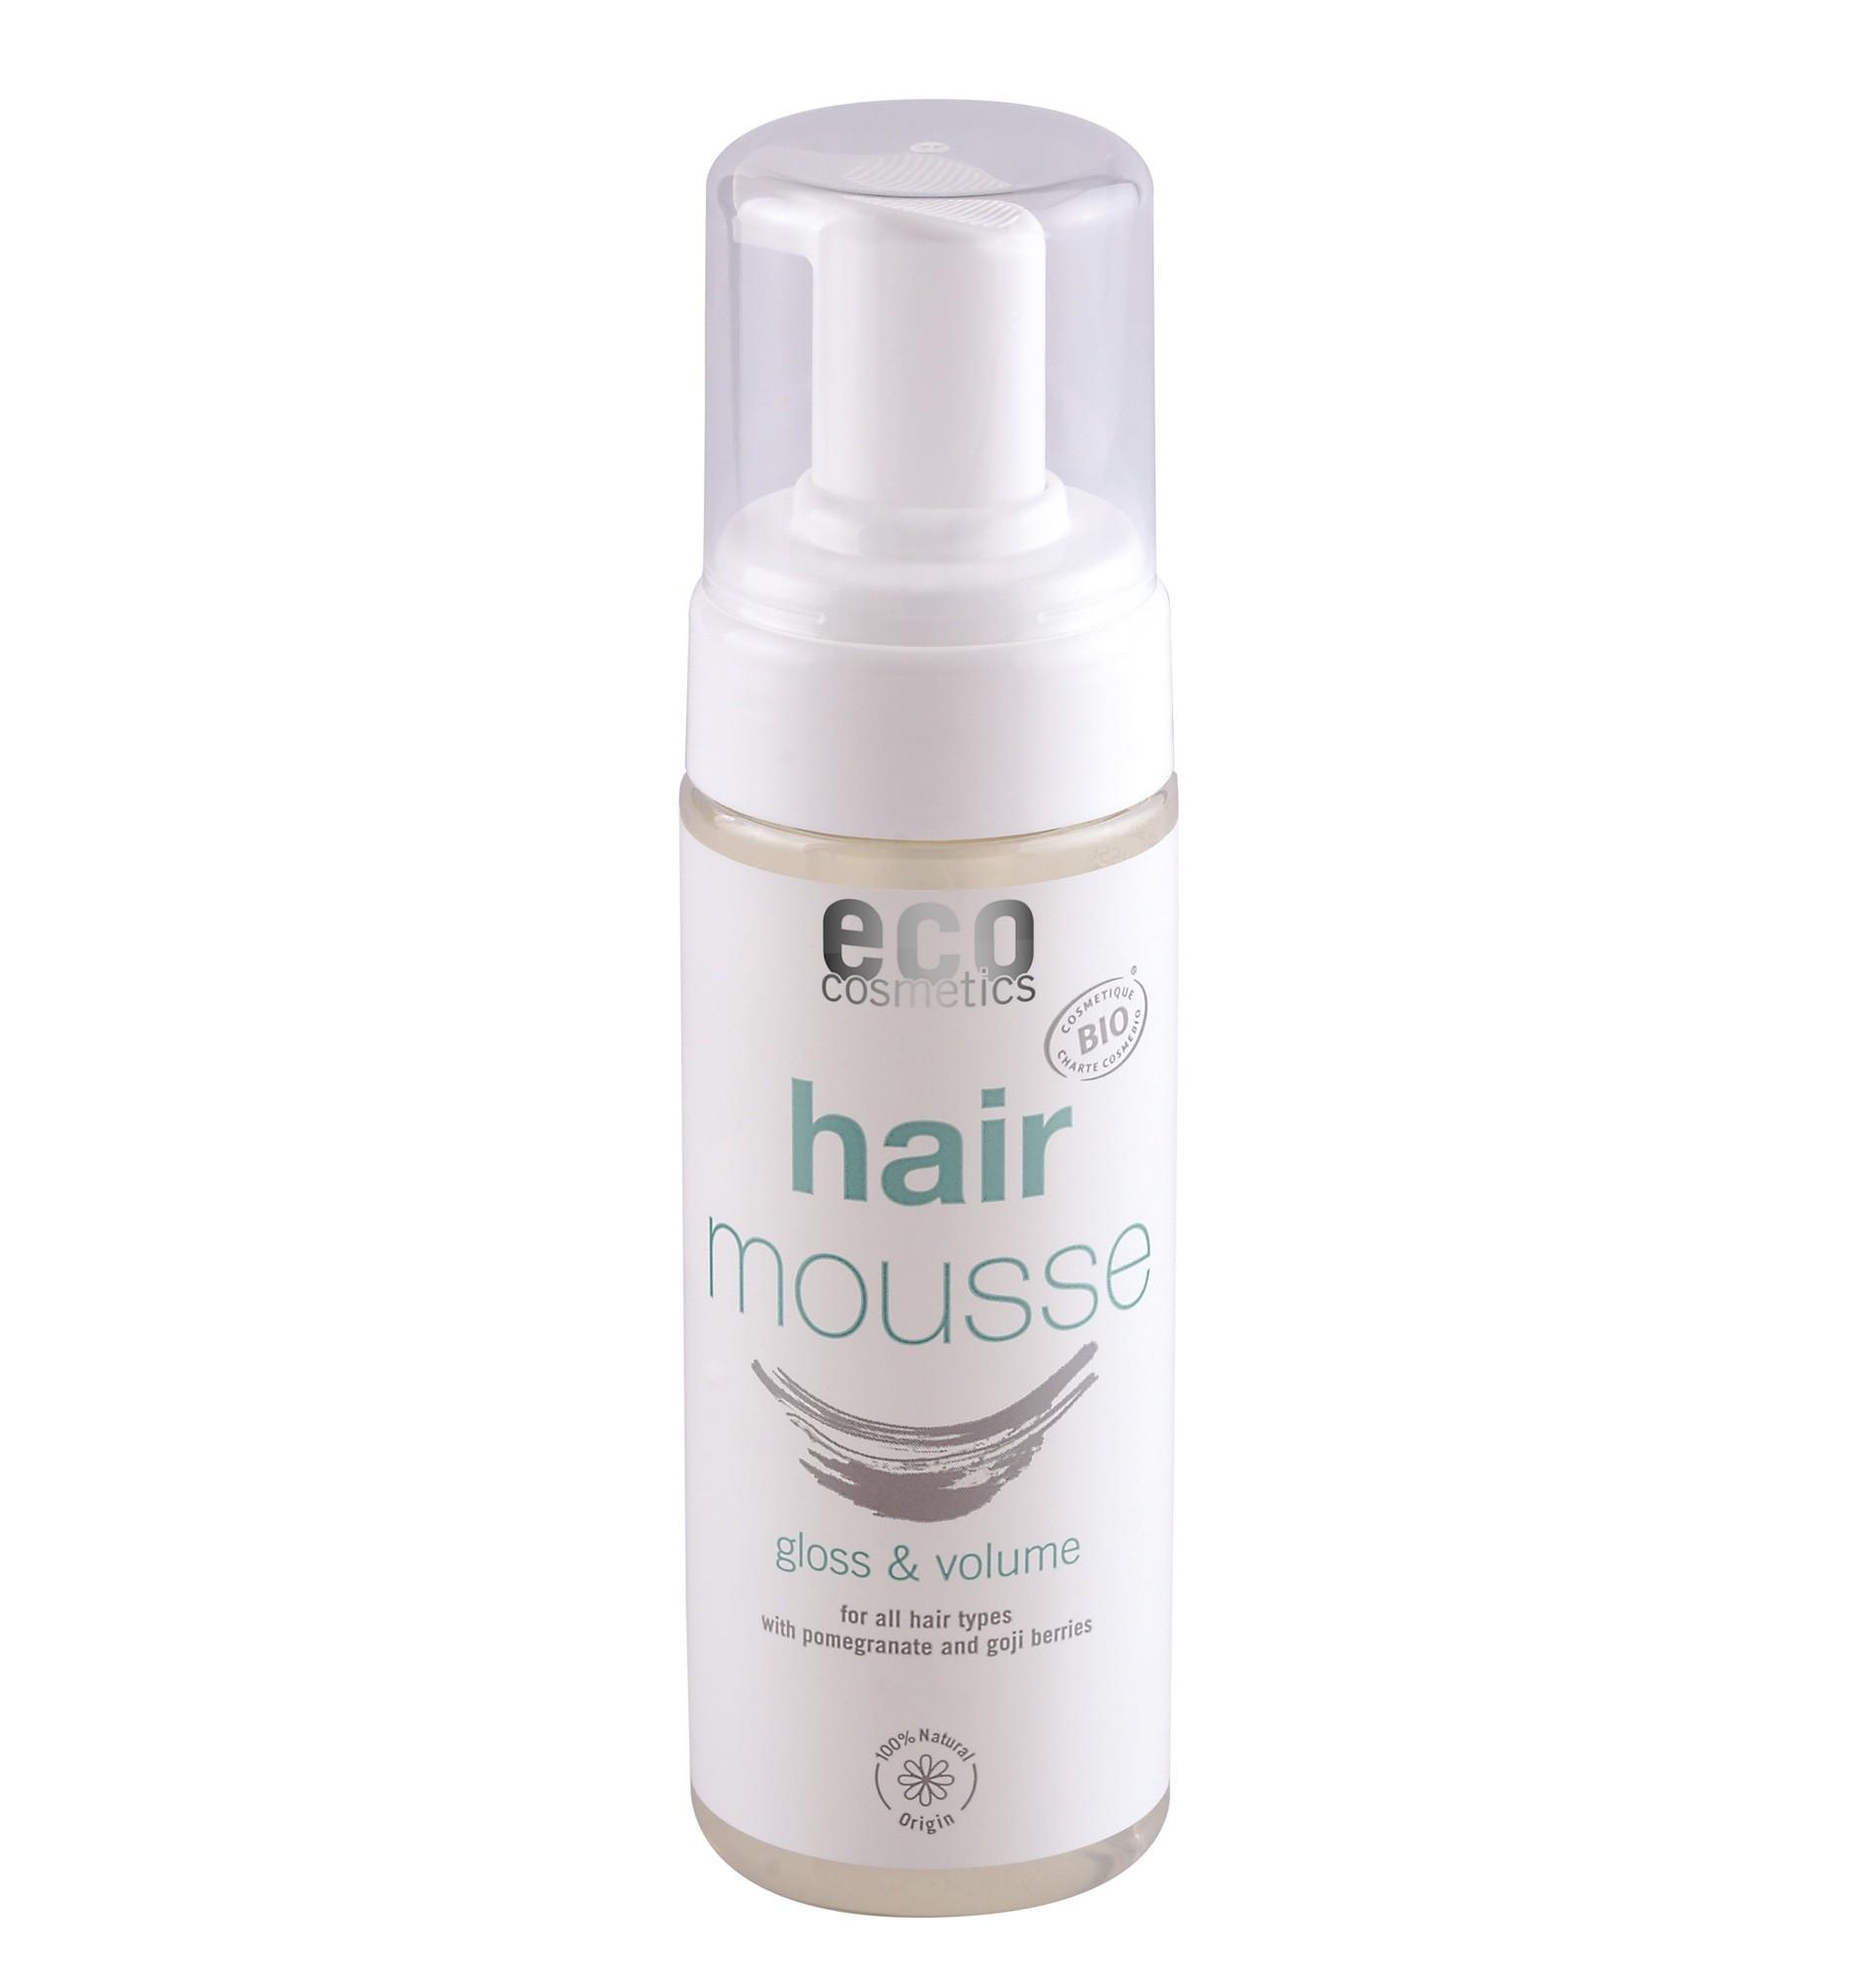 Eco Cosmetics Hair Mousse